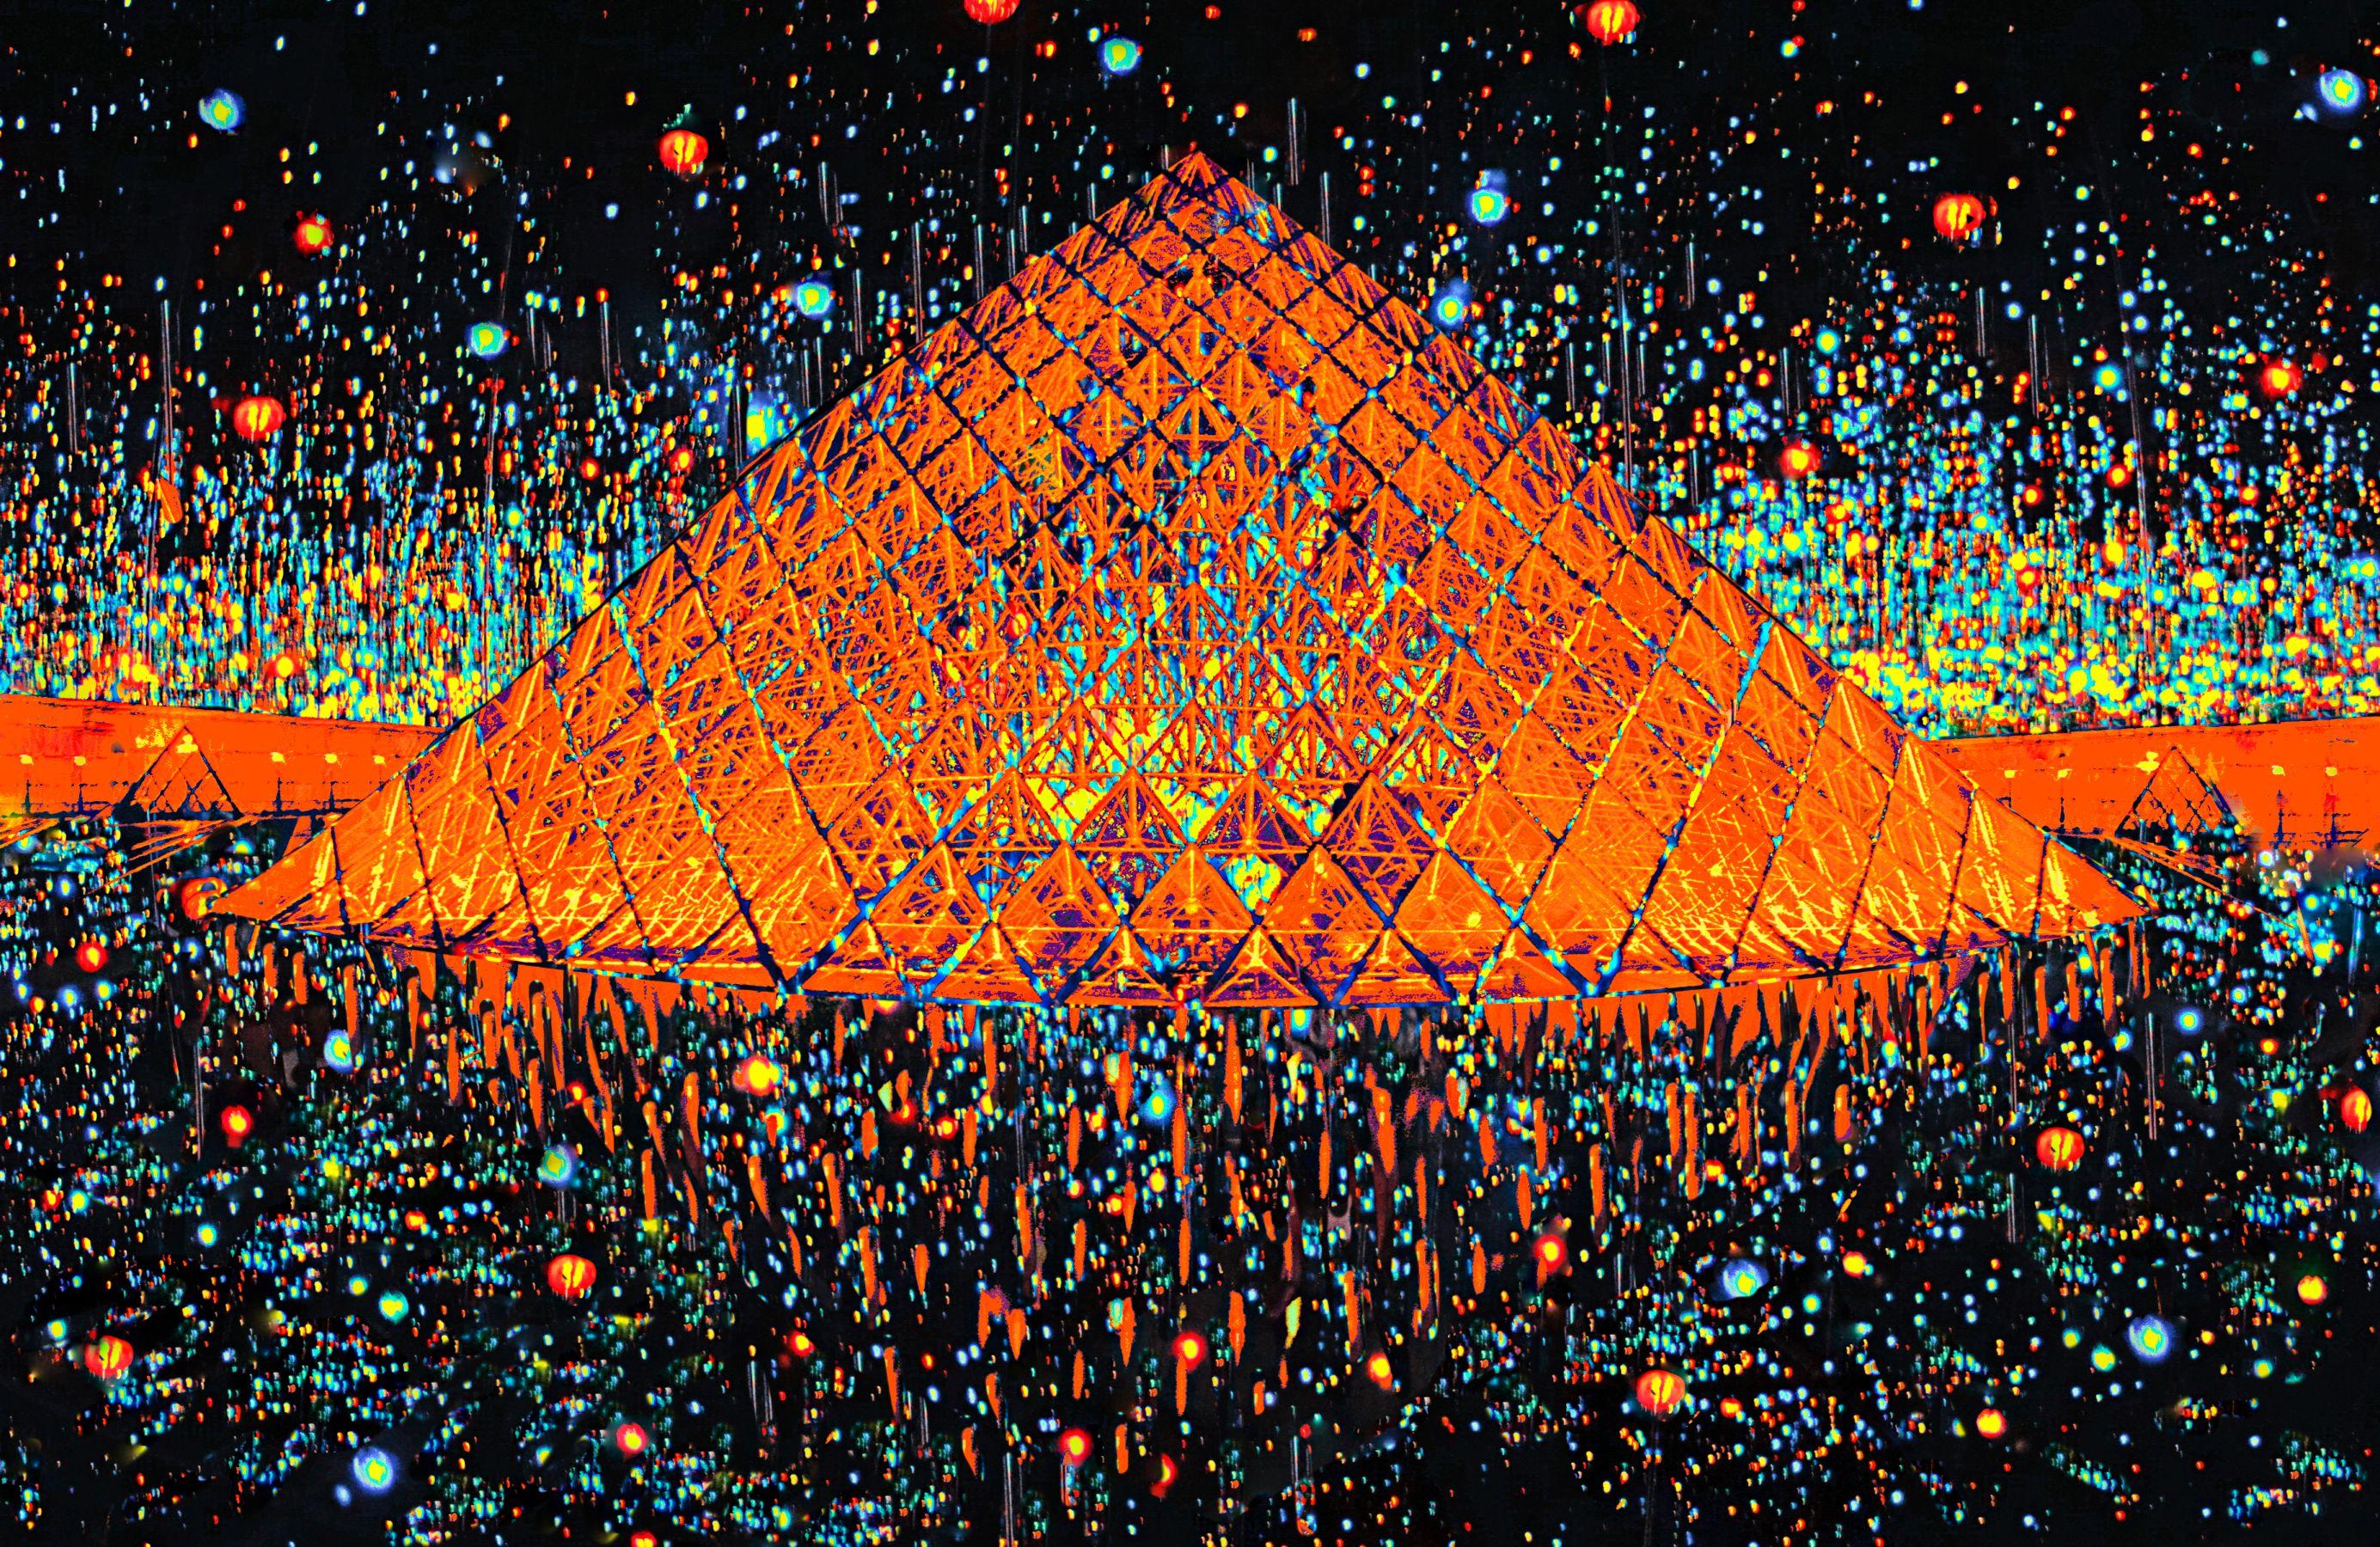 Gottlieb-Paris Pyramid at Midnight lgsm.jpg